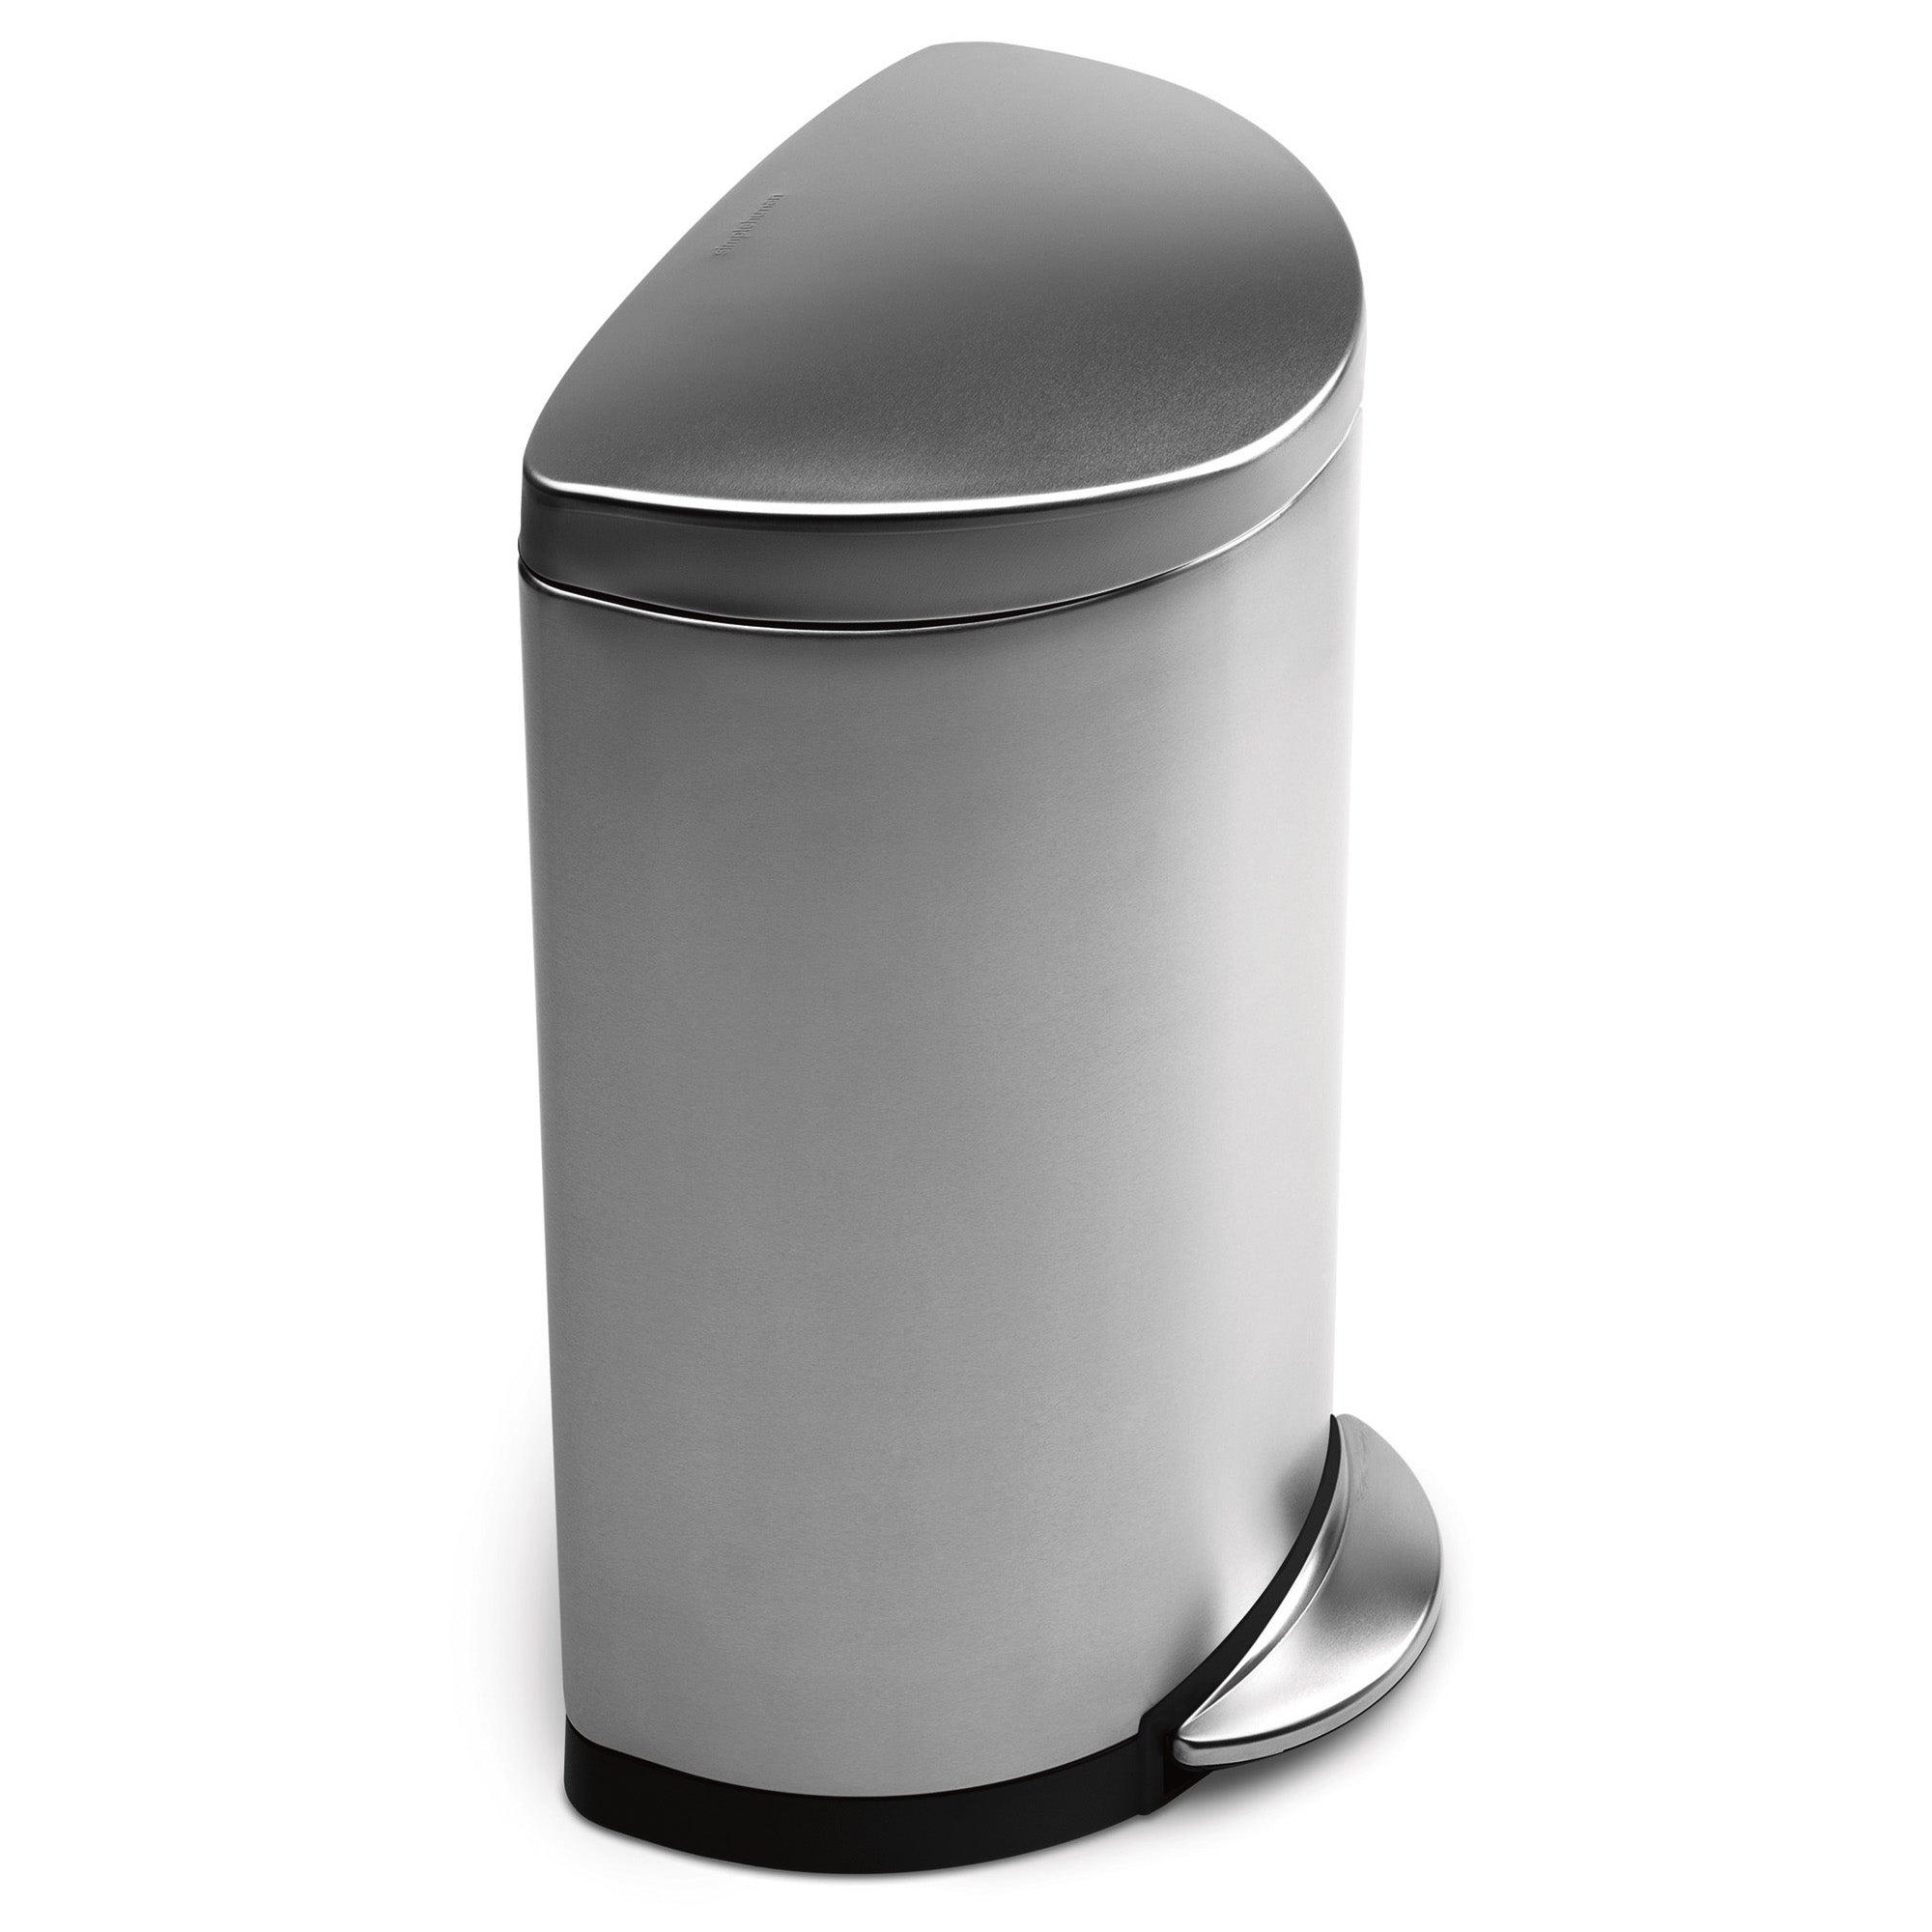 simplehuman 40 Litre Semi Round Stainless Steel Pedal Bin